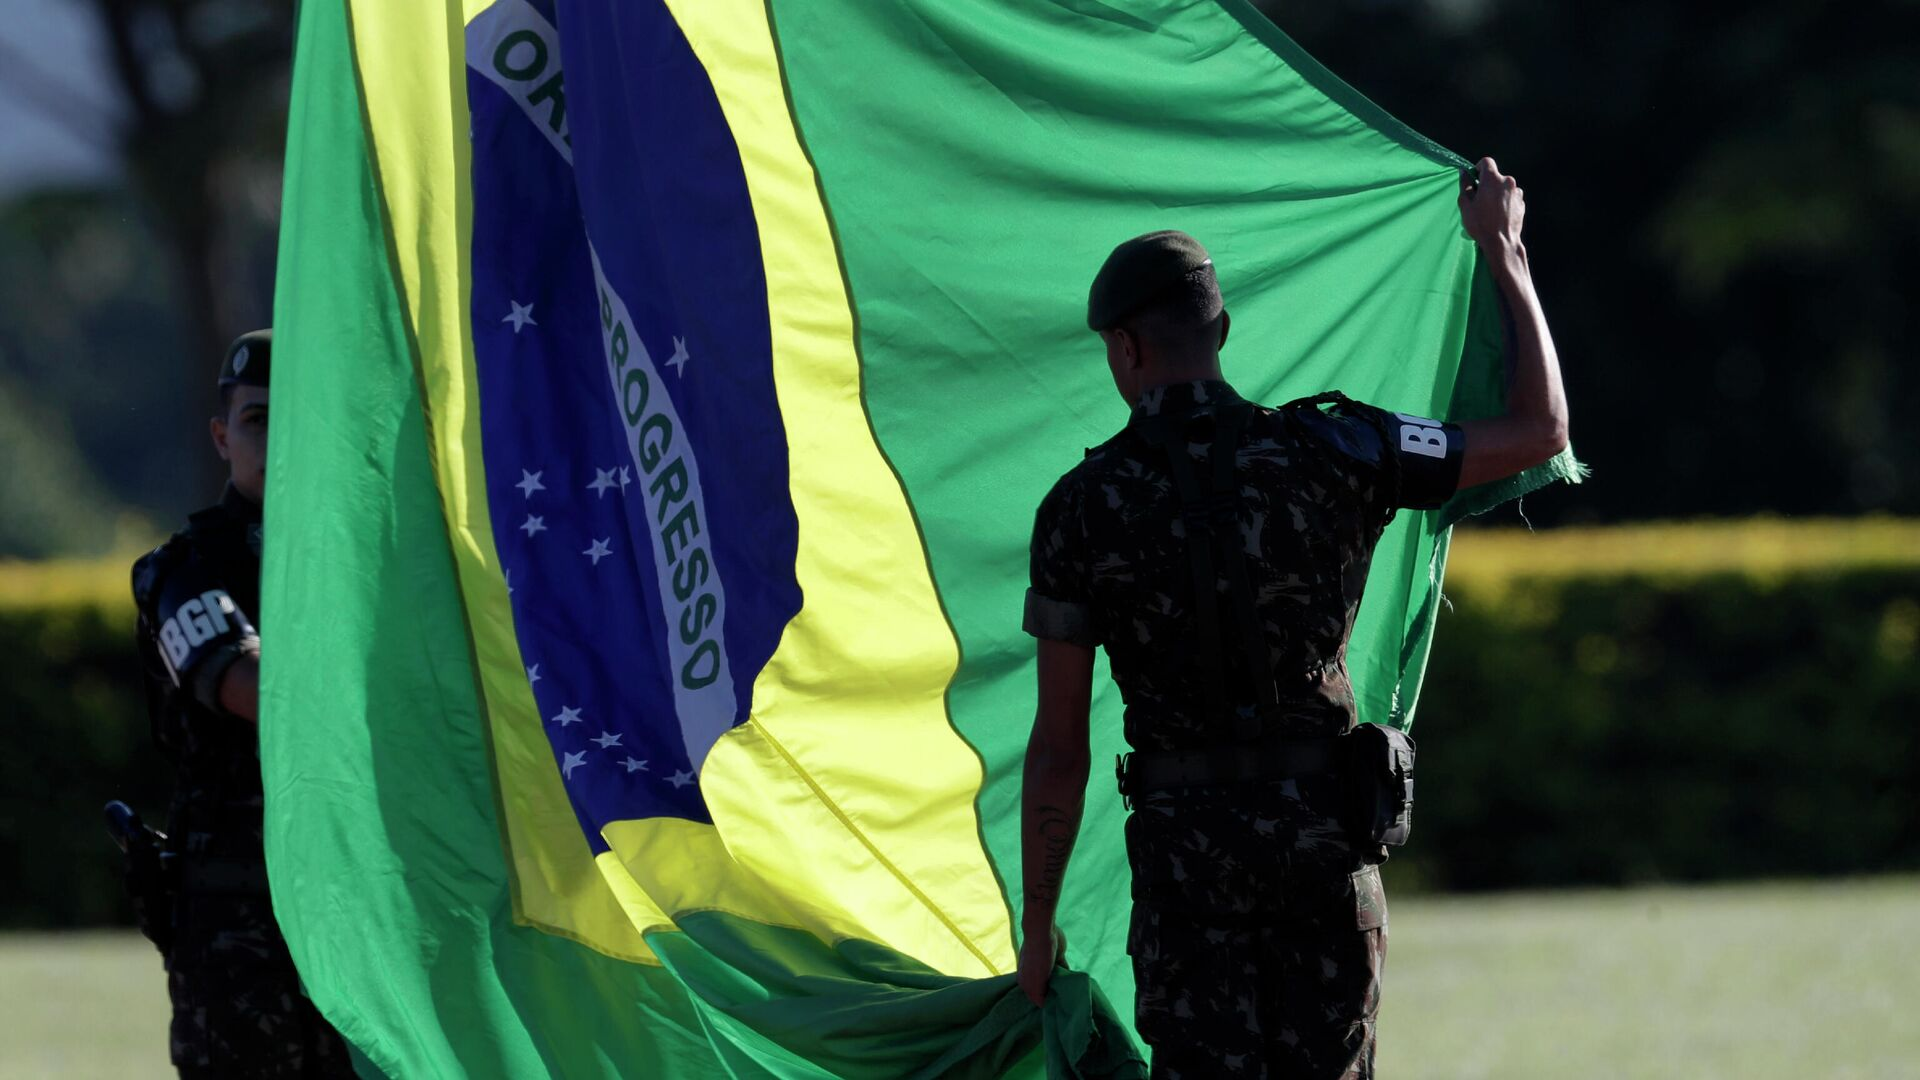 Soldados con la bandera de Brasil - Sputnik Mundo, 1920, 08.09.2021